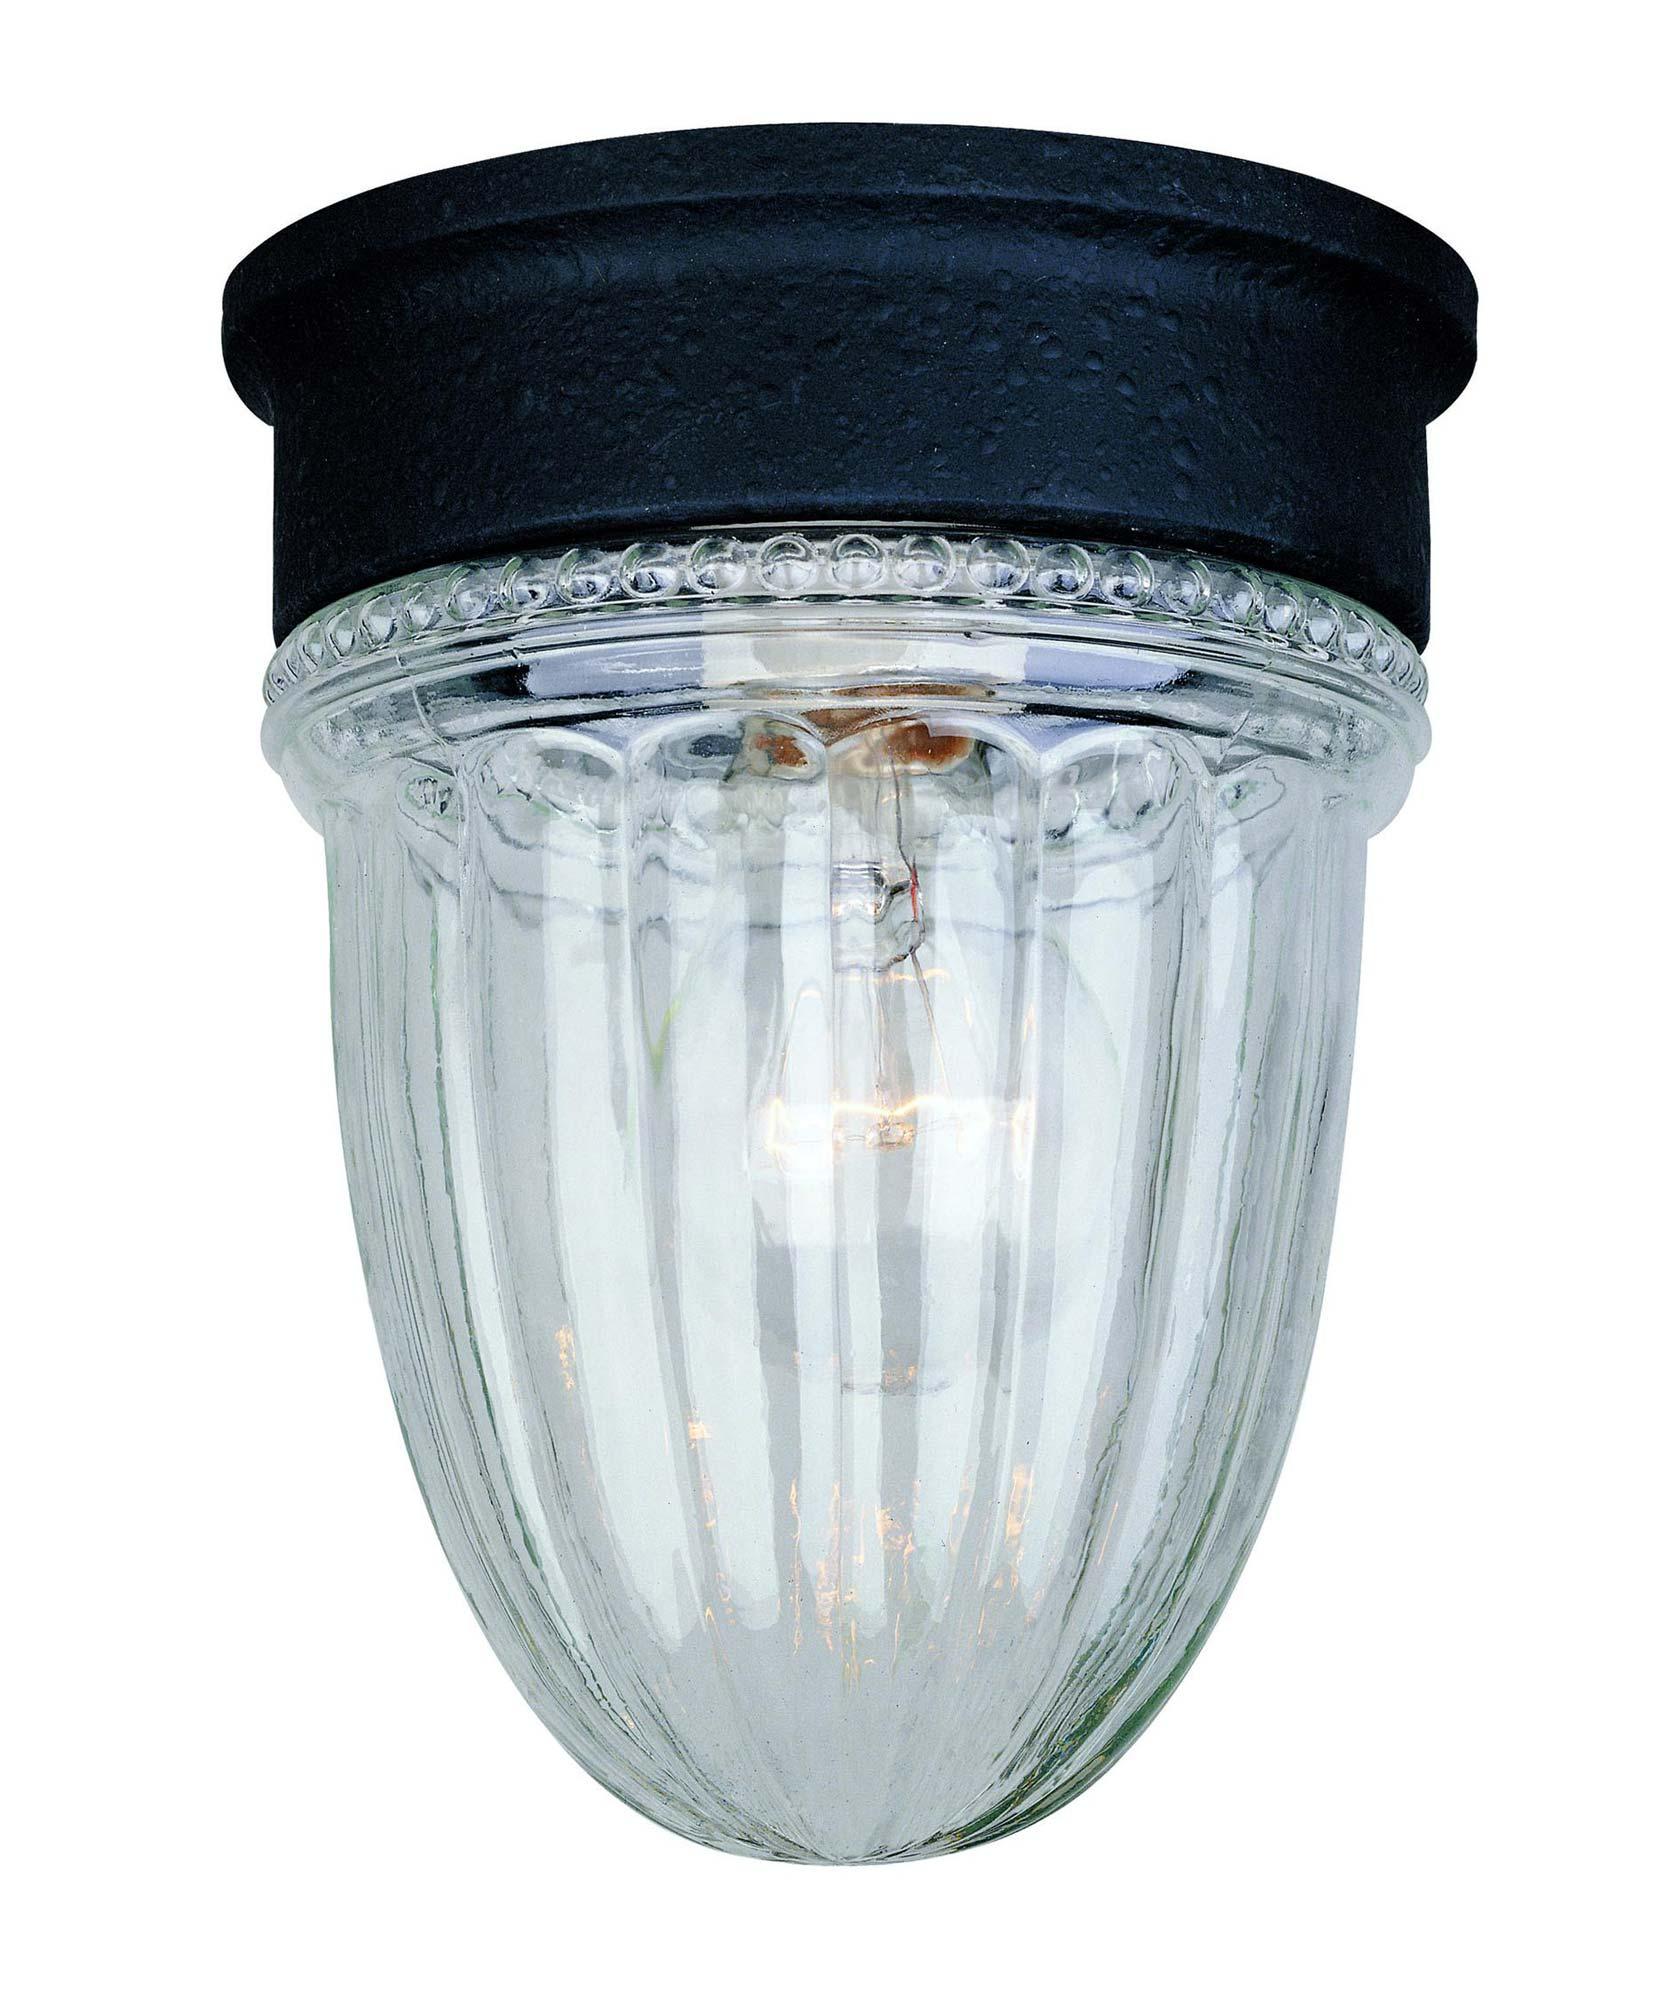 Jar outdoor ceiling flush light by savoy house kp 5 4901c 31 jelly jar outdoor ceiling flush light by savoy house kp 5 4901c 31 arubaitofo Gallery